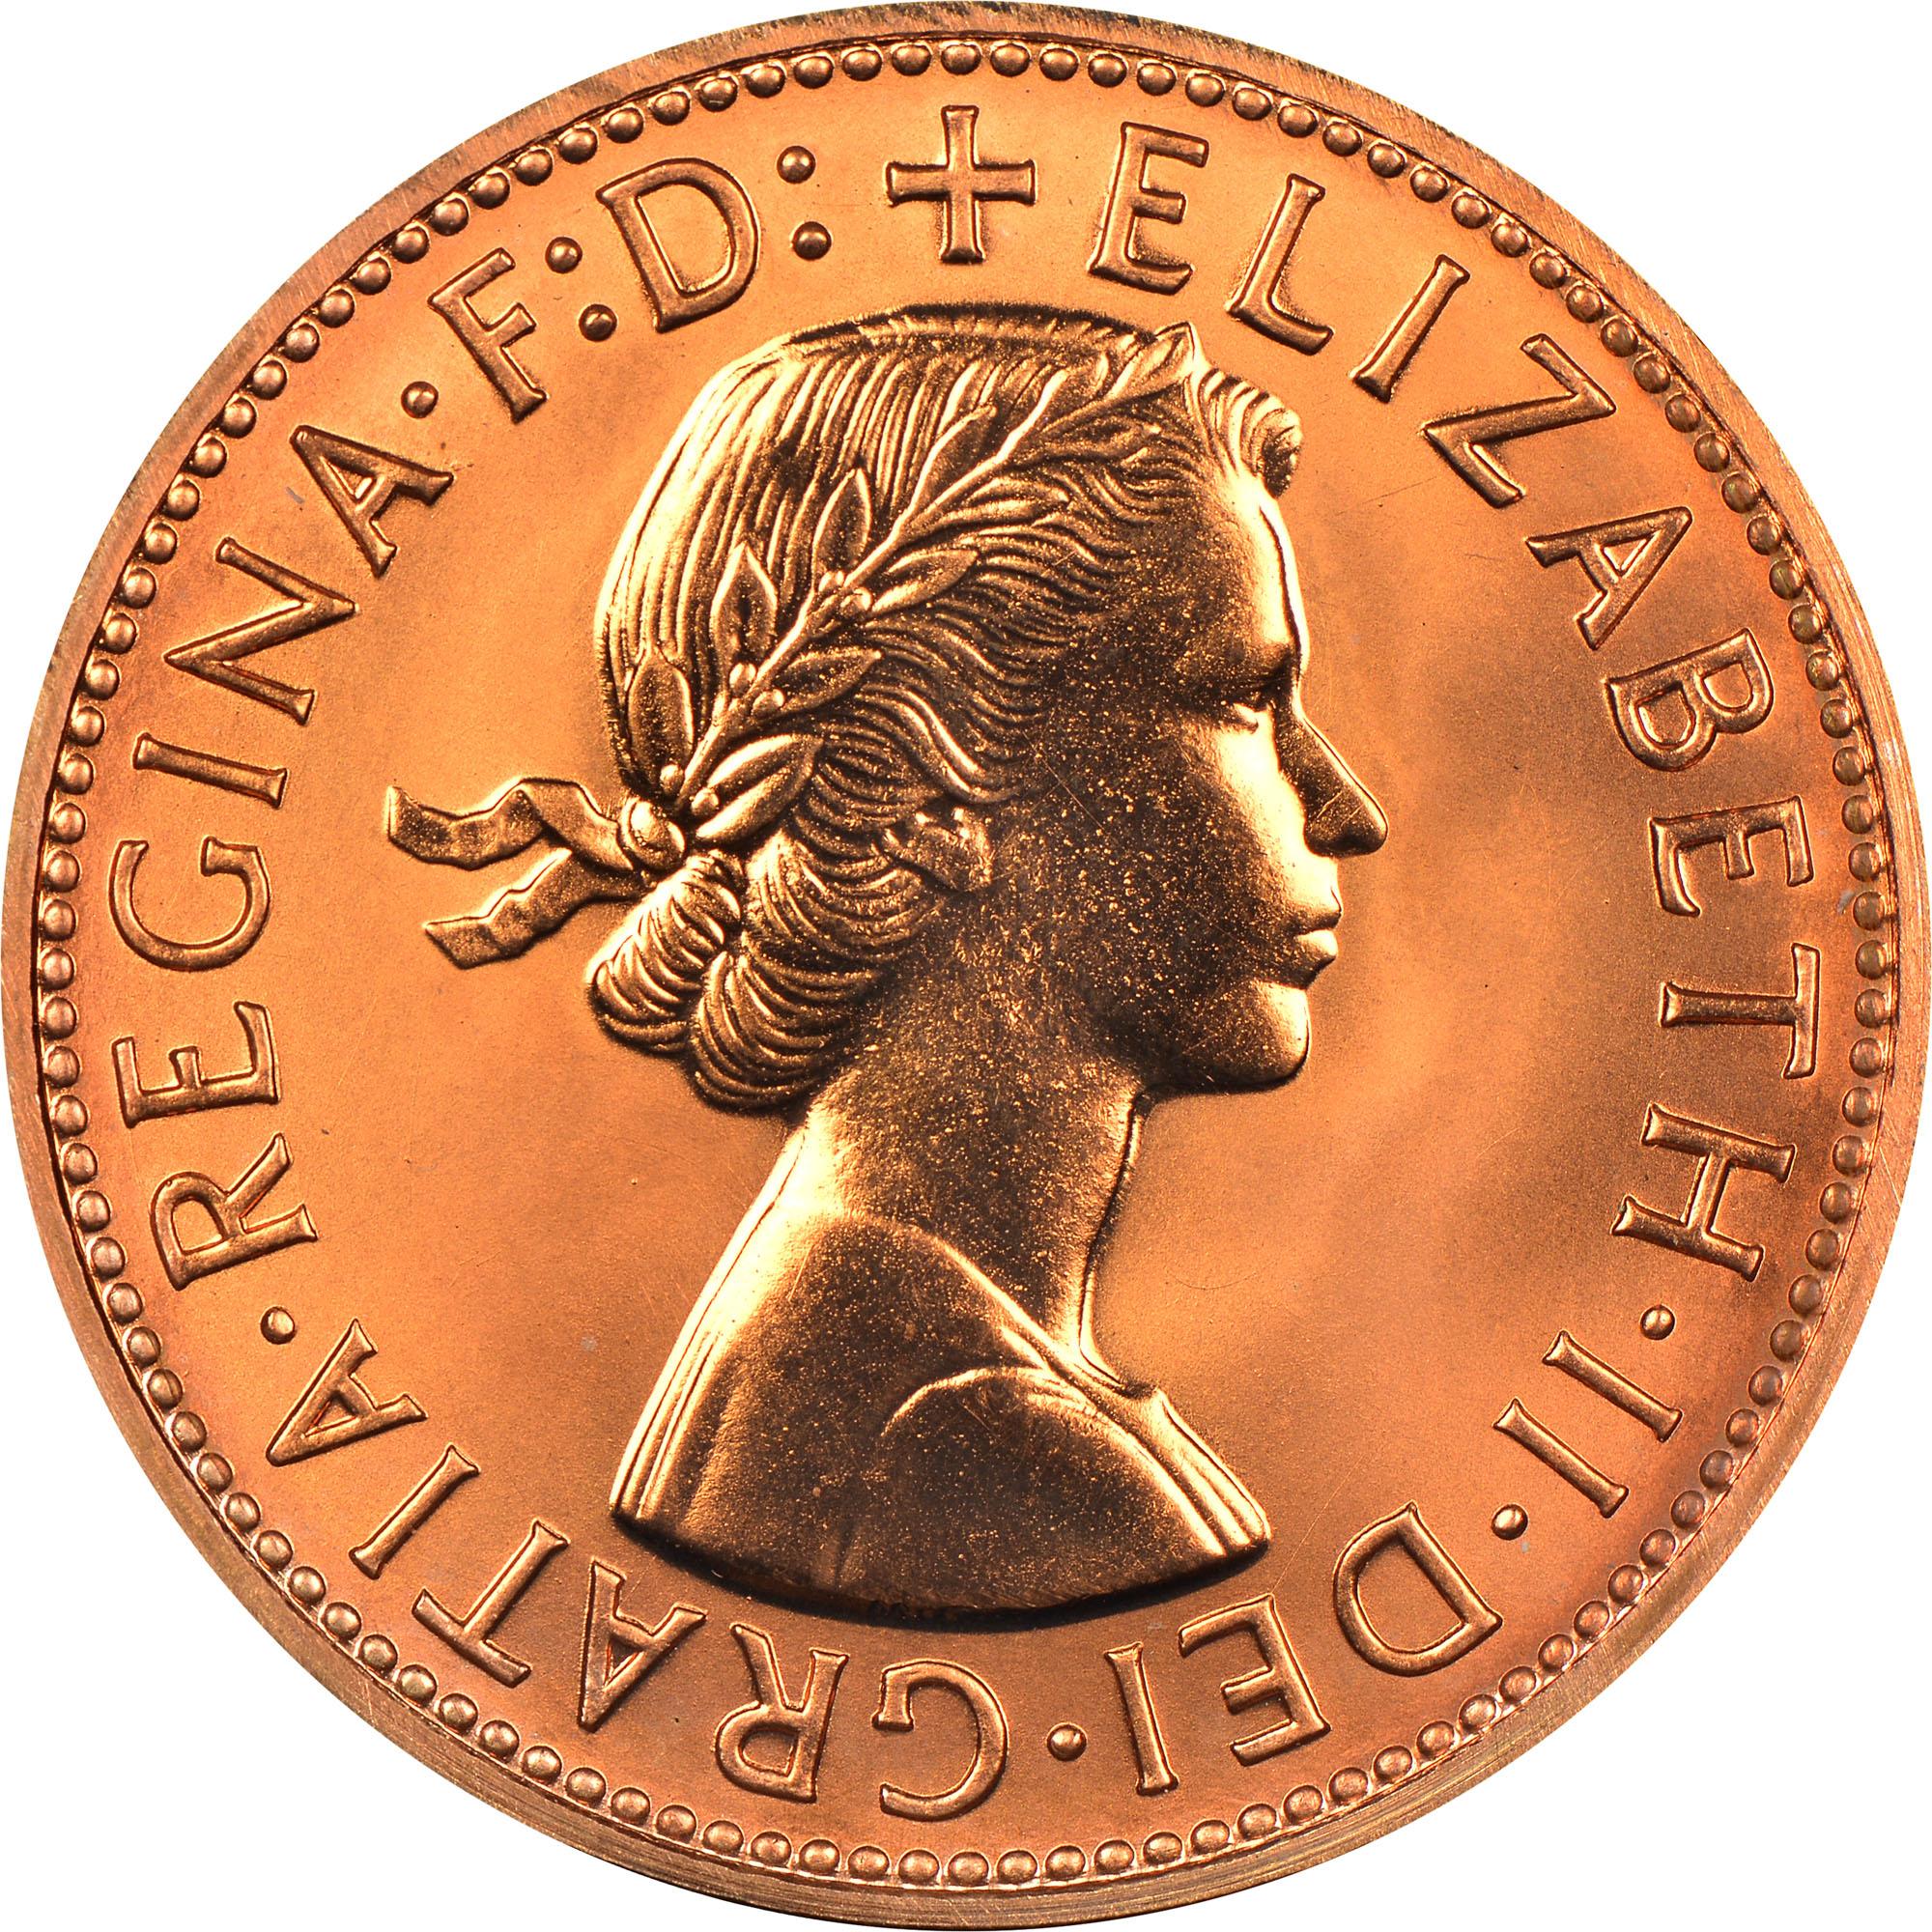 1955-1964 Australia Penny obverse